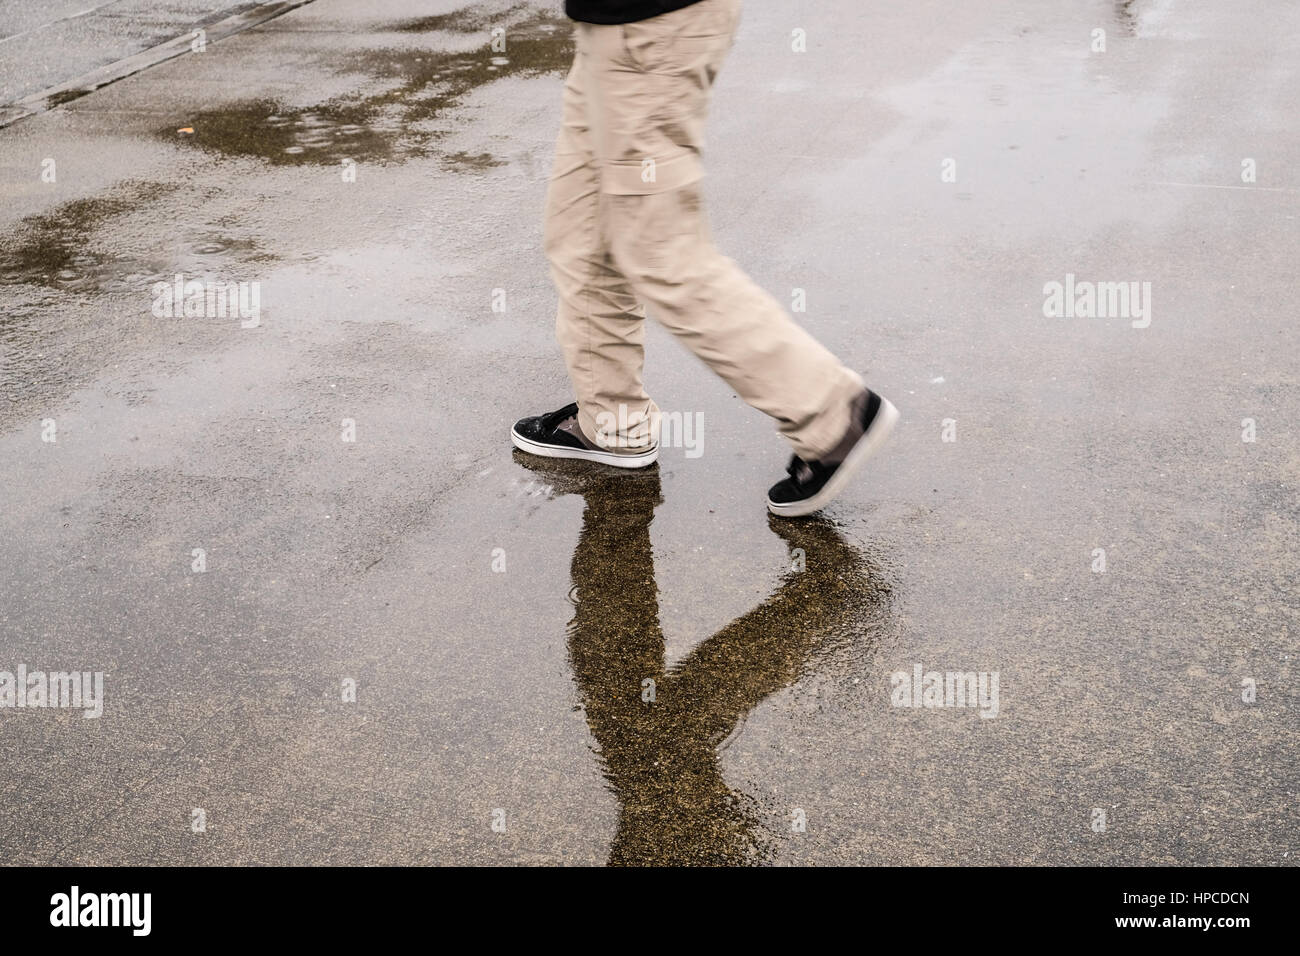 A boy walking in the rain - Stock Image